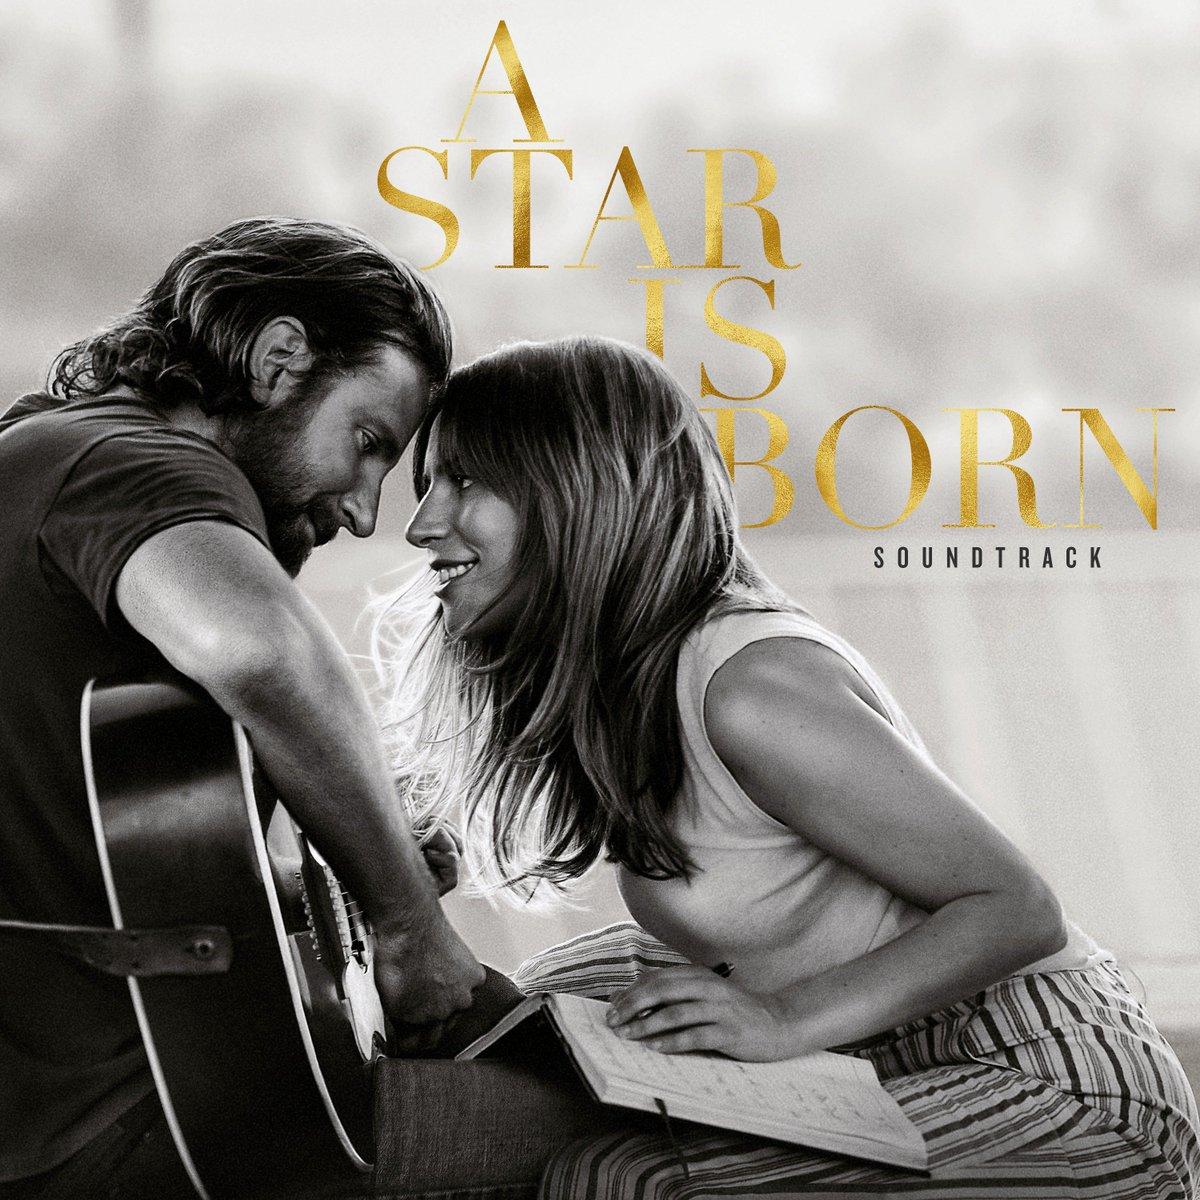 RT @Interscope: Get the #AStarIsBorn Soundtrack for $3.99 on @amazonmusic. https://t.co/g4xDg5i2cz https://t.co/oL21ycA32J